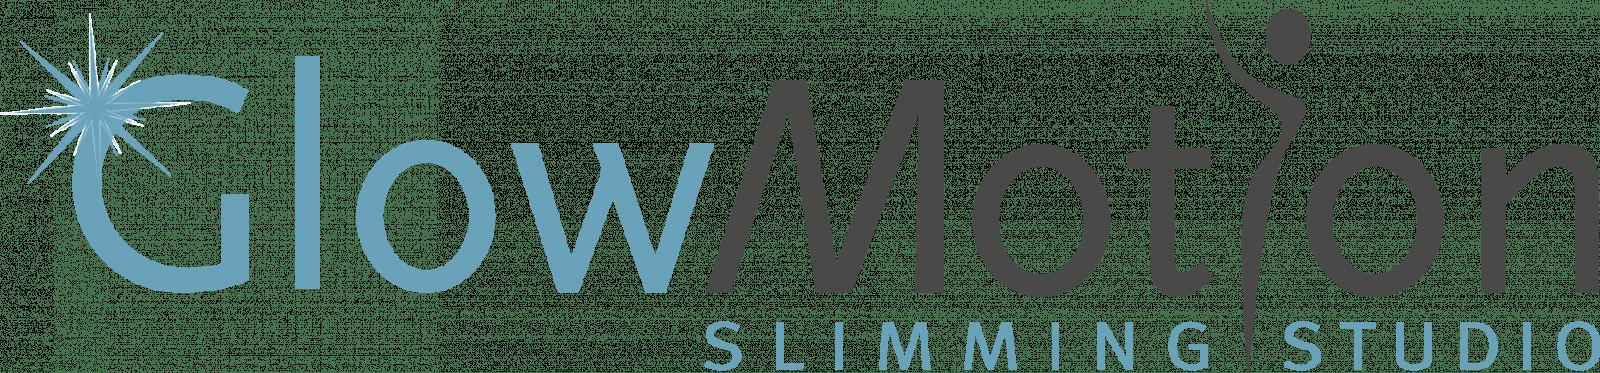 GlowMotion Slimmingstudio